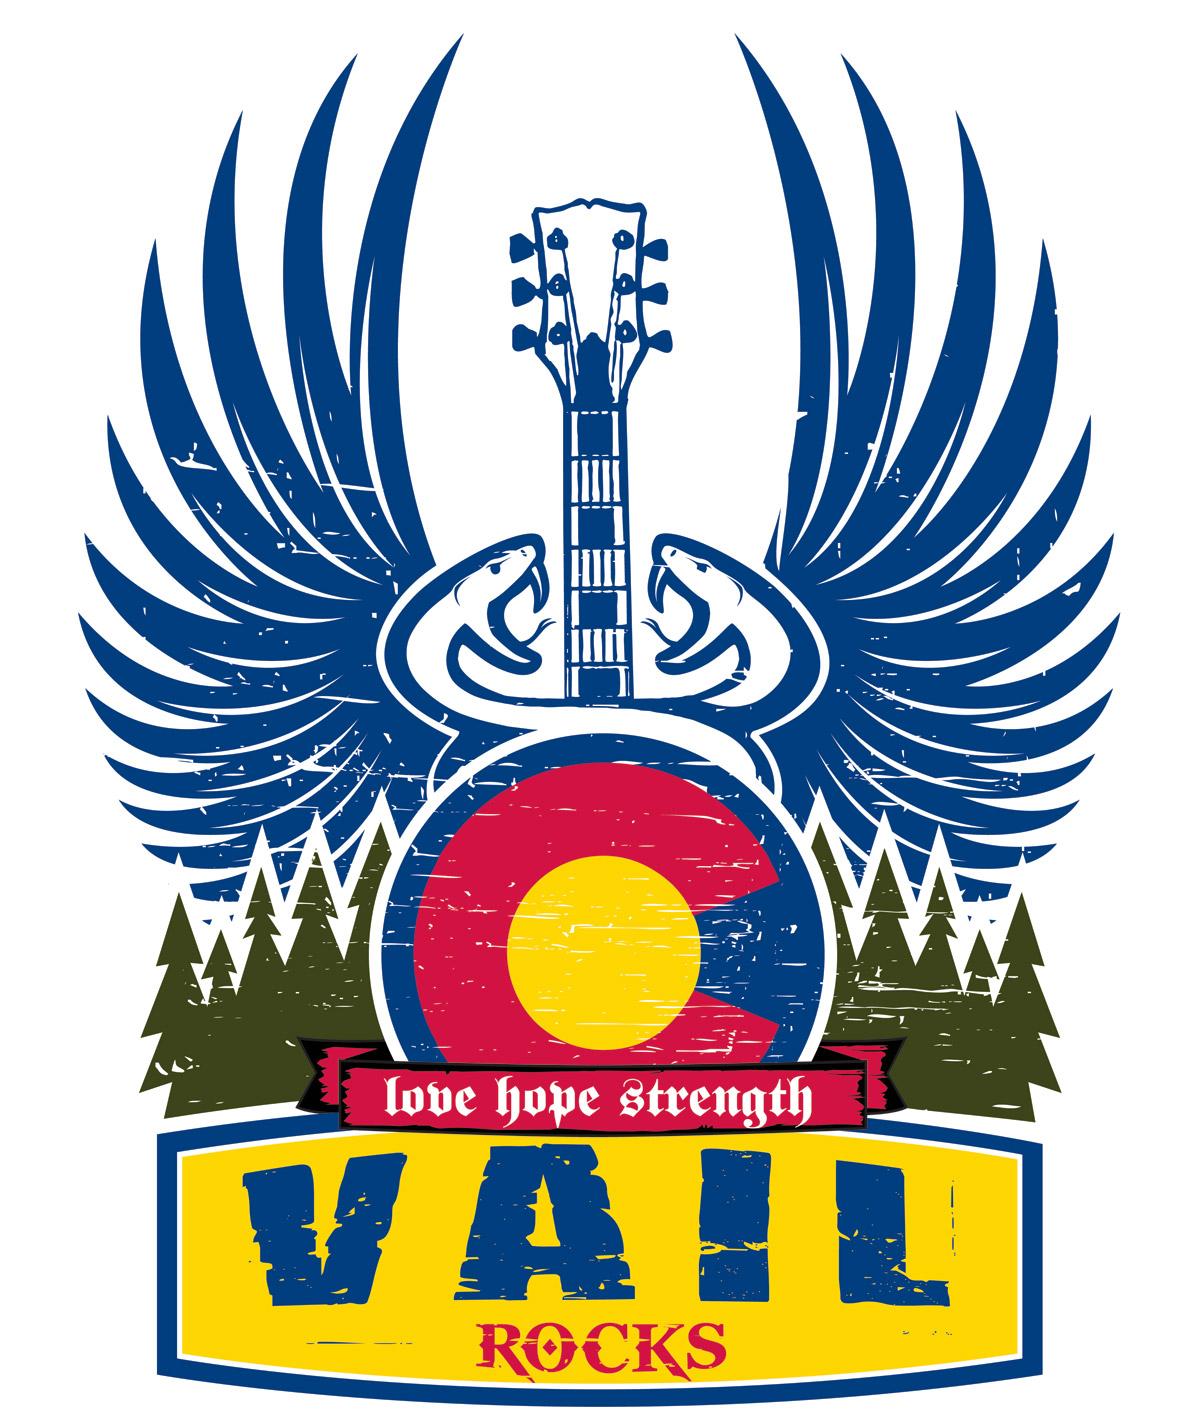 VailRocks_2013_web